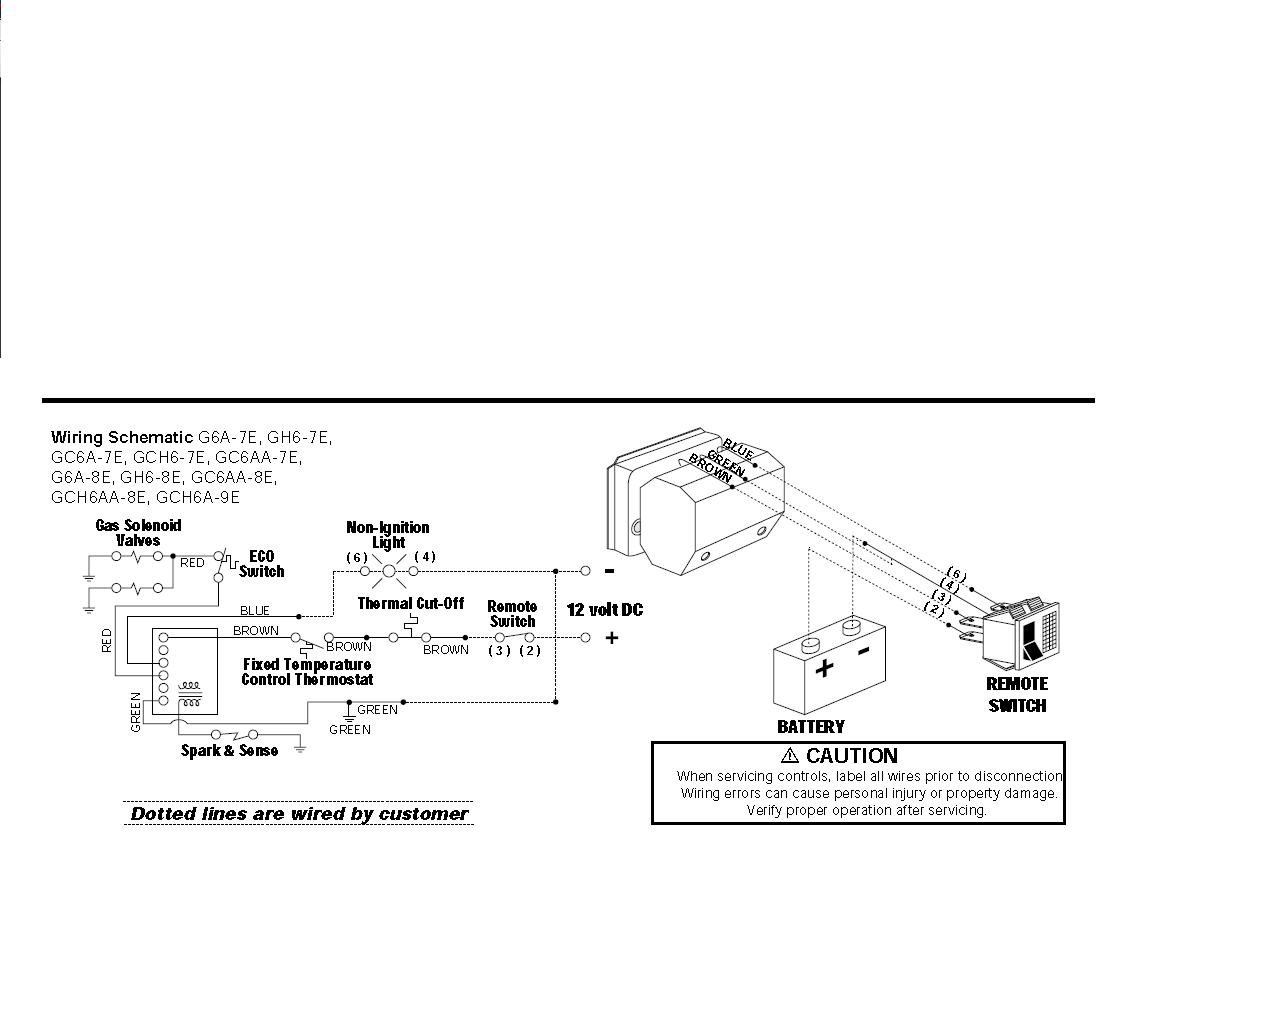 Hydro Flame Furnace Manual